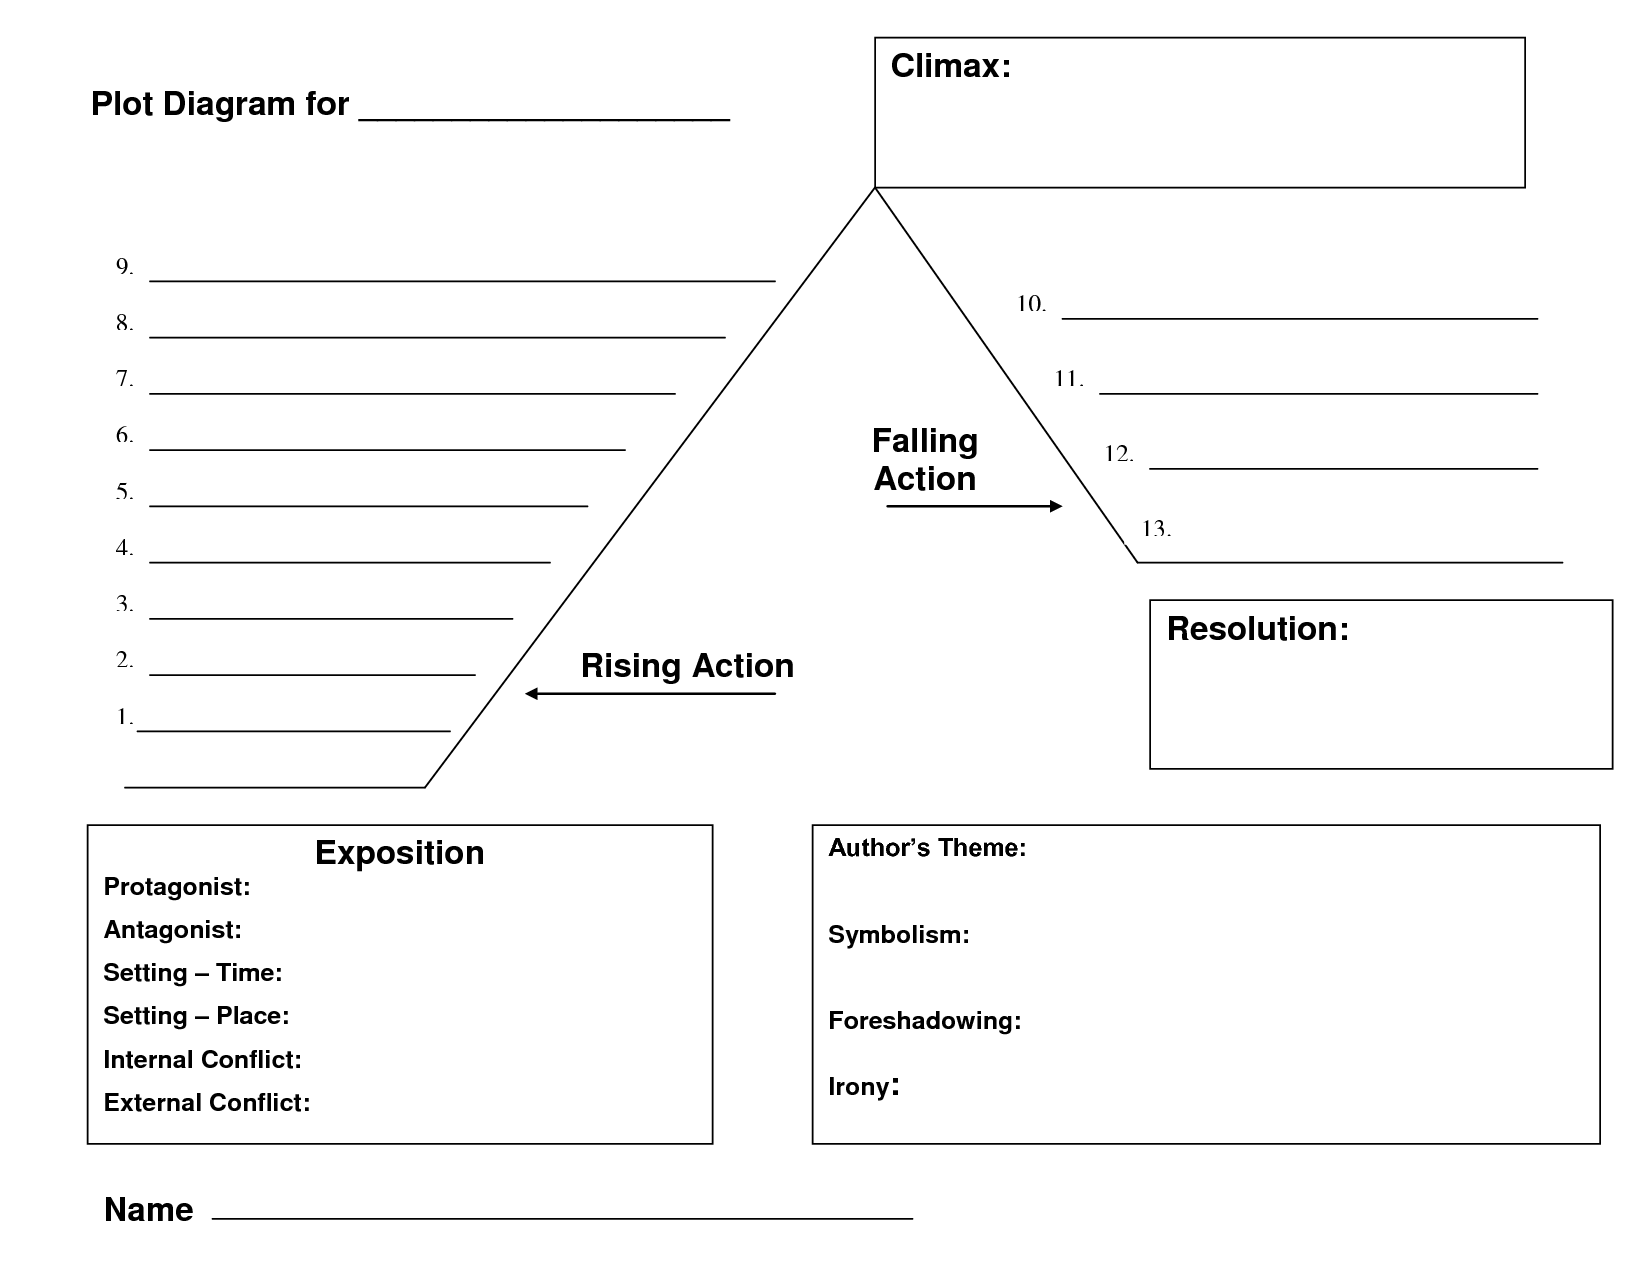 Plot Diagram Of Pride And Prejudice Rs485 2 Wire Connection Printables Structure Worksheet Worksheets Davezan Bloggakuten